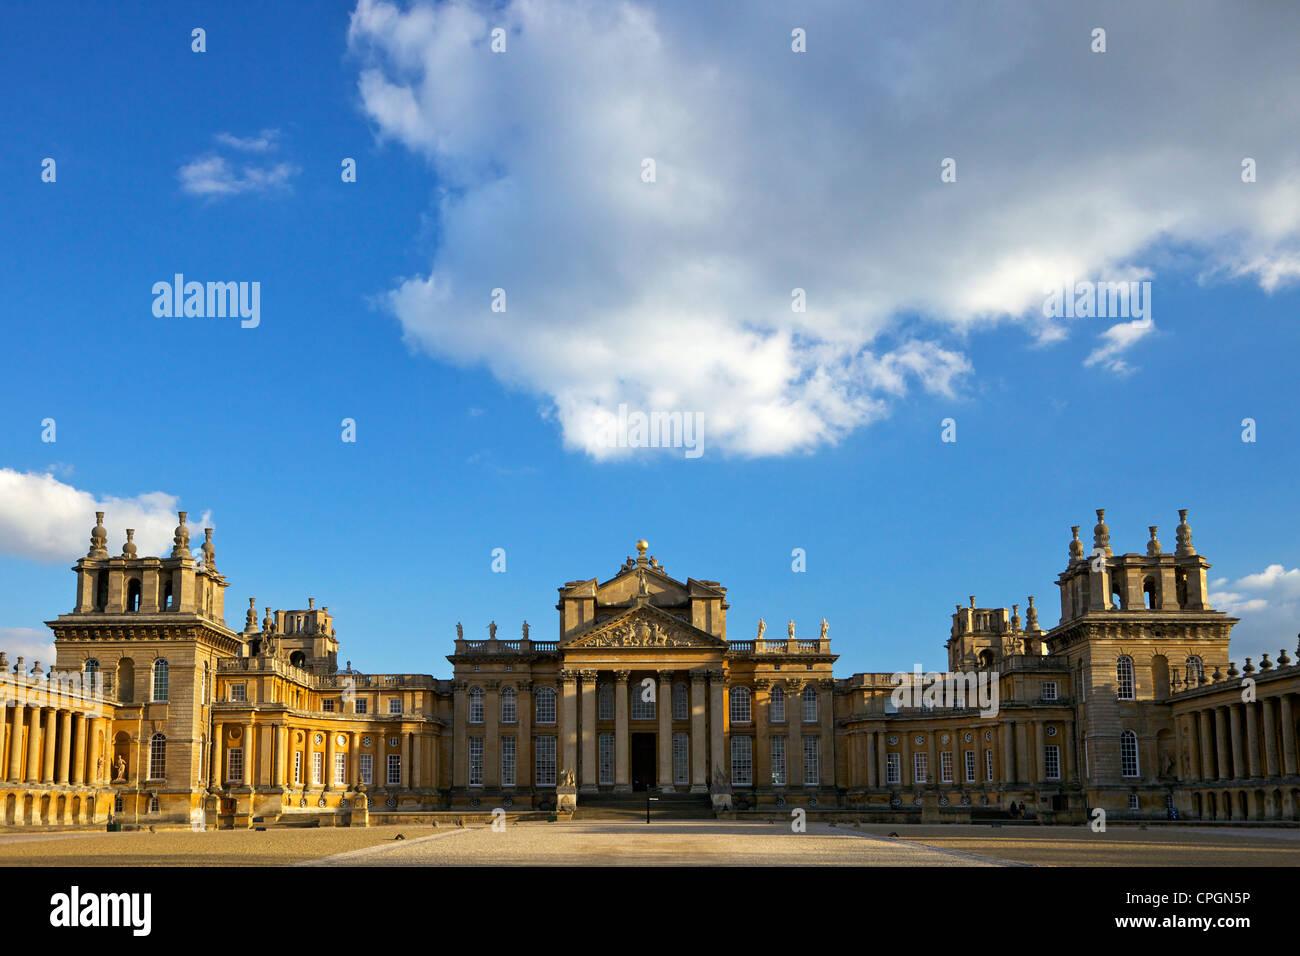 Great Court of Blenheim Palace, birthplace of Sir Winston Churchill, Woodstock, Oxfordshire, England, UK, United - Stock Image